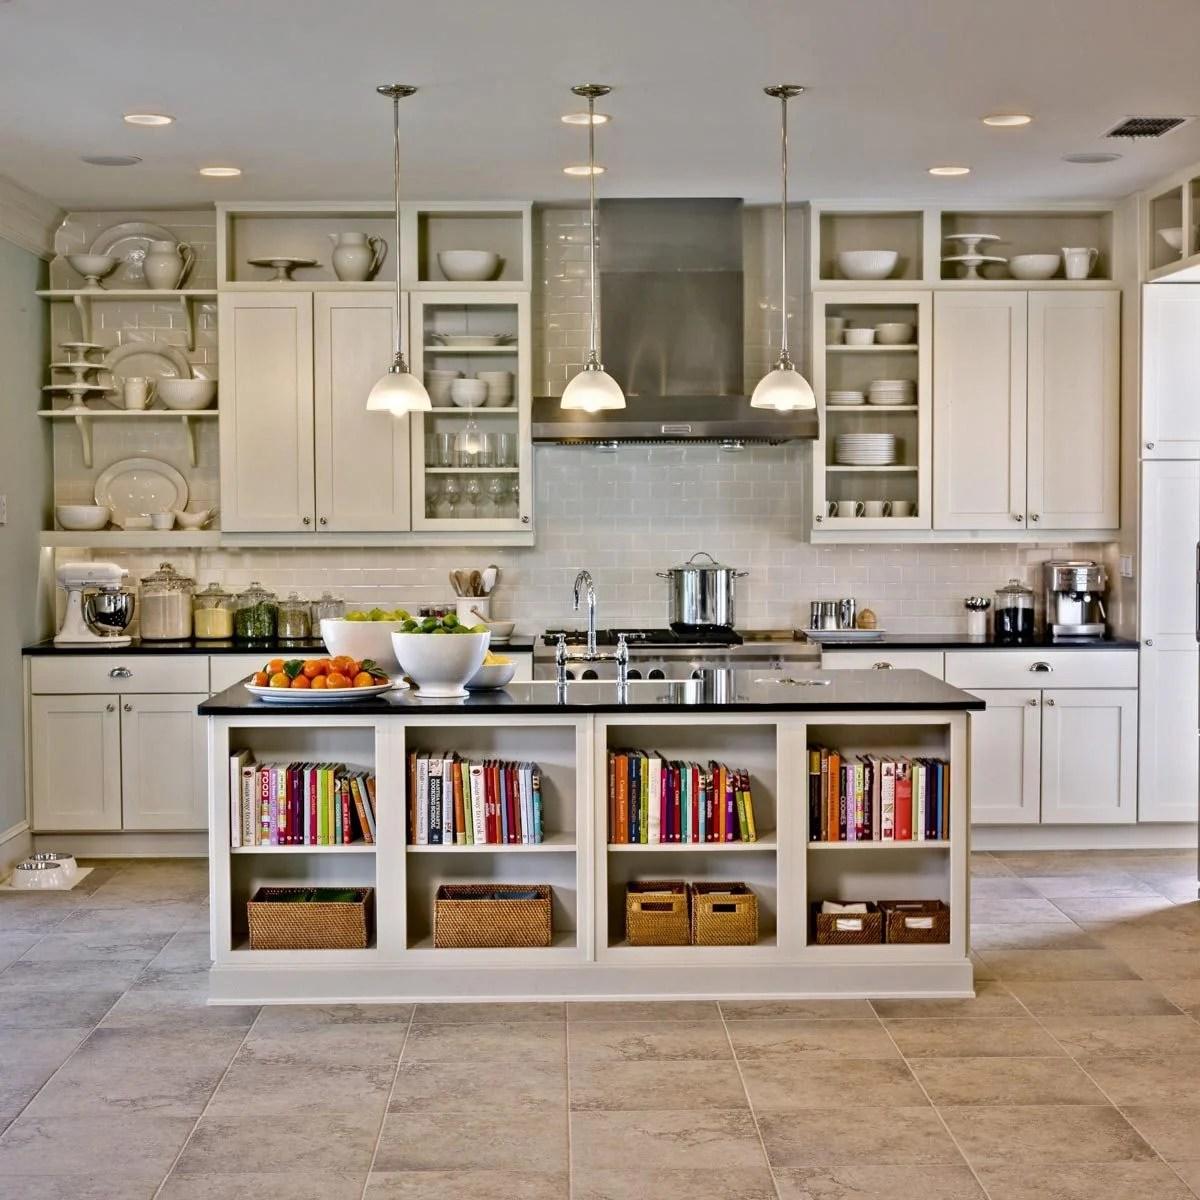 The 12 Best DIY Kitchen Islands — The Family Handyman